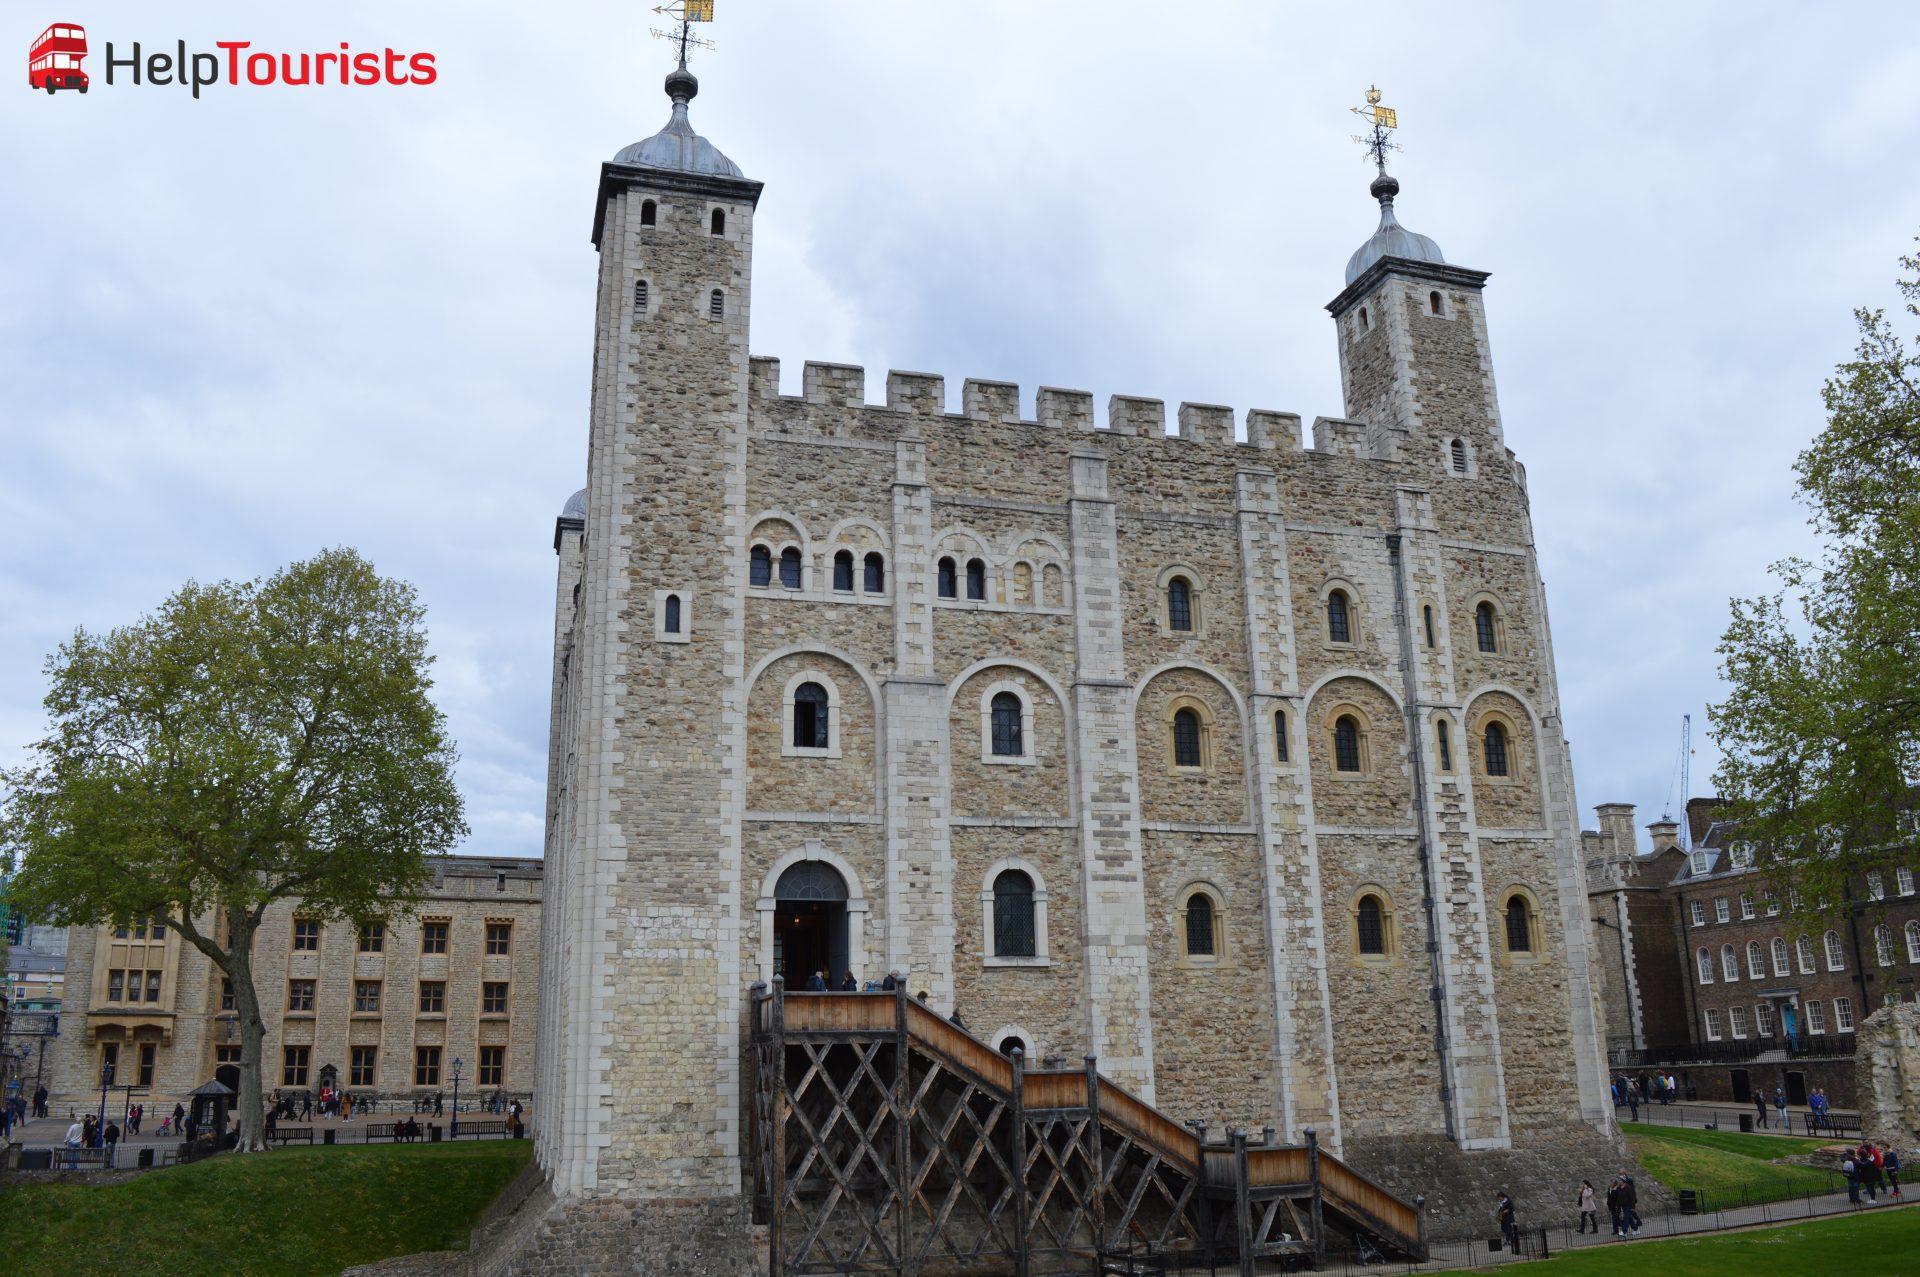 Tower of London Hauptturm